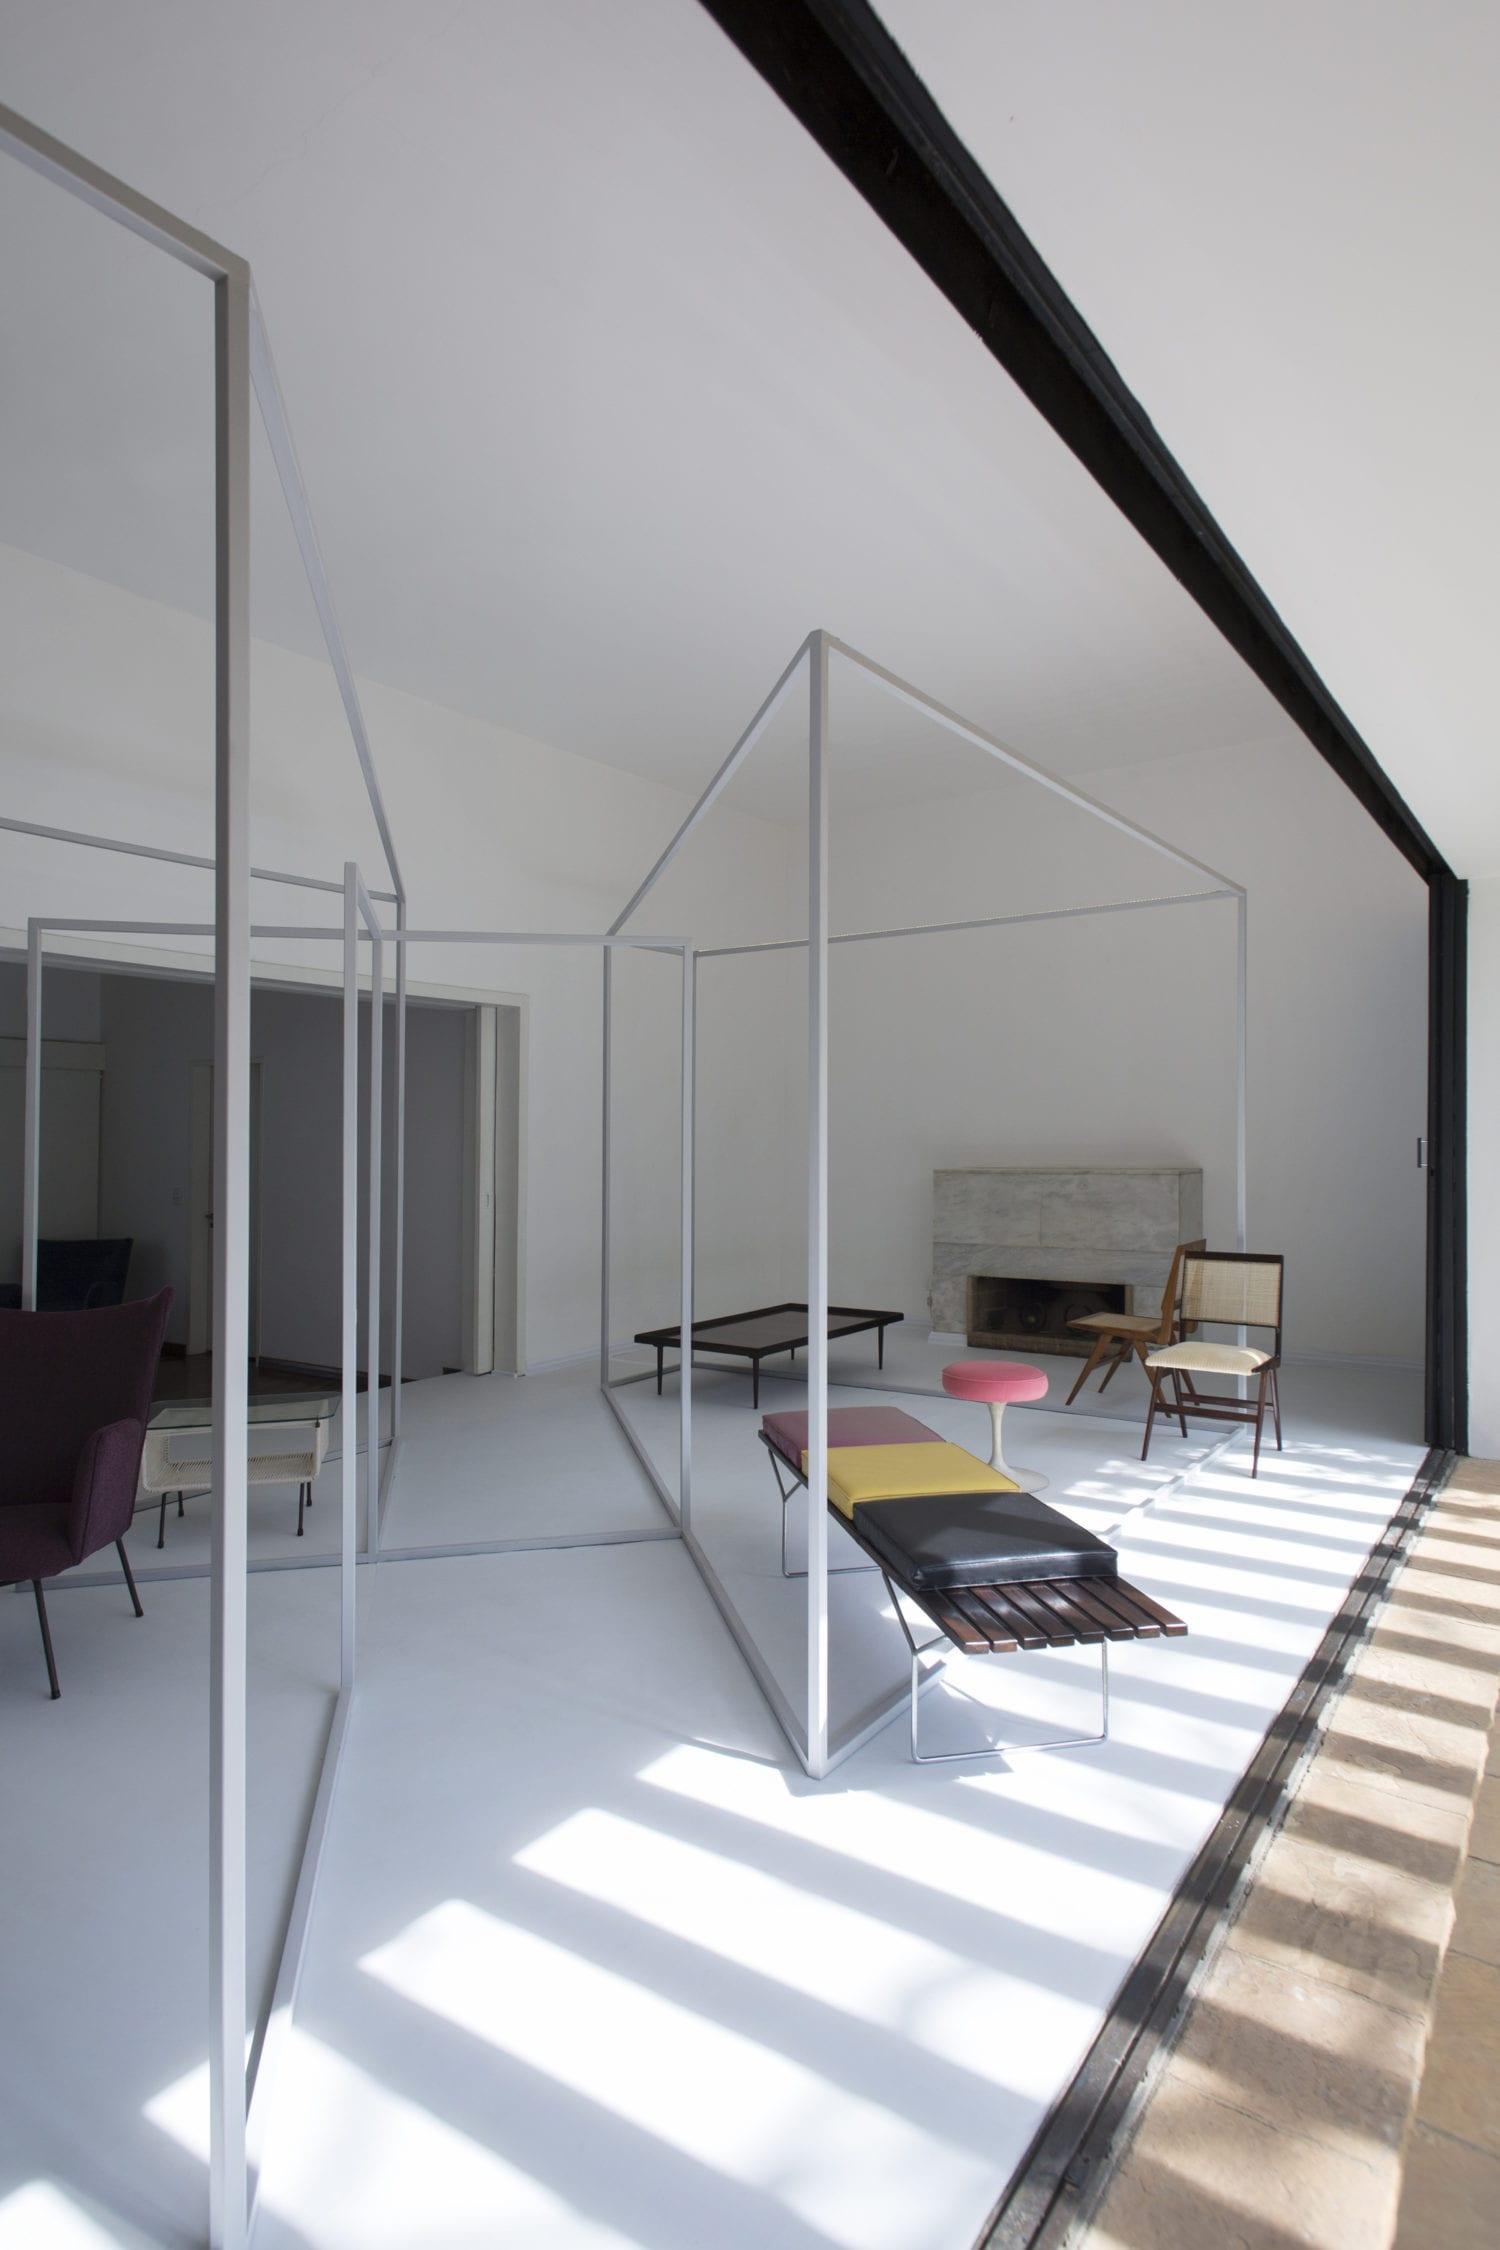 Apartment 61 Home Gallery In Sao Paulo Brazil By Mnma Studio Yellowtrace 01